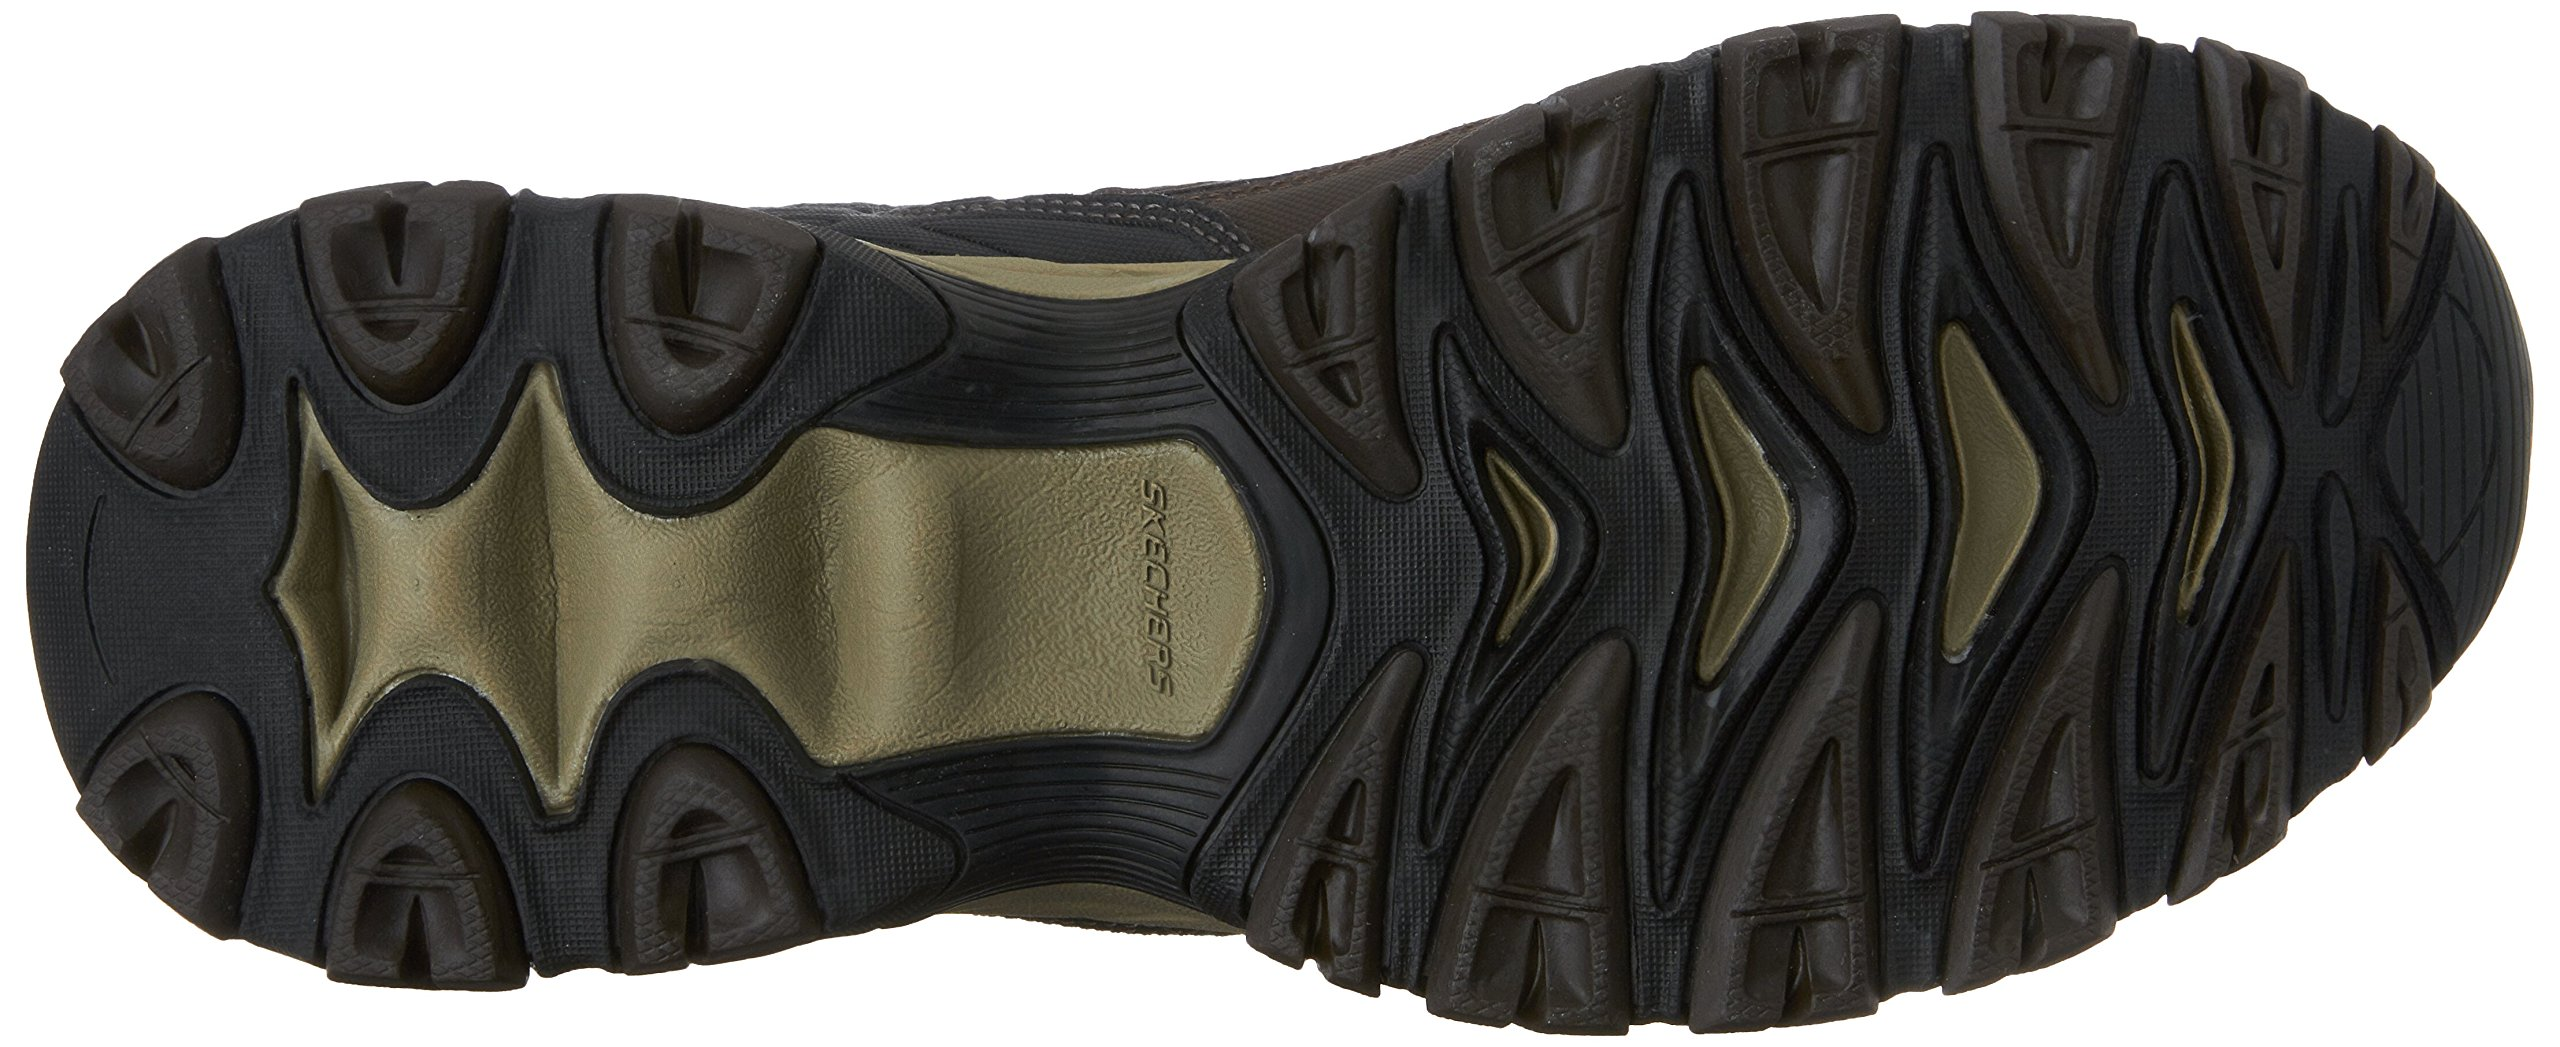 Skechers Men's AFTERBURNM.FIT Memory Foam Lace-Up Sneaker, Brown/Taupe, 7 M US by Skechers (Image #3)